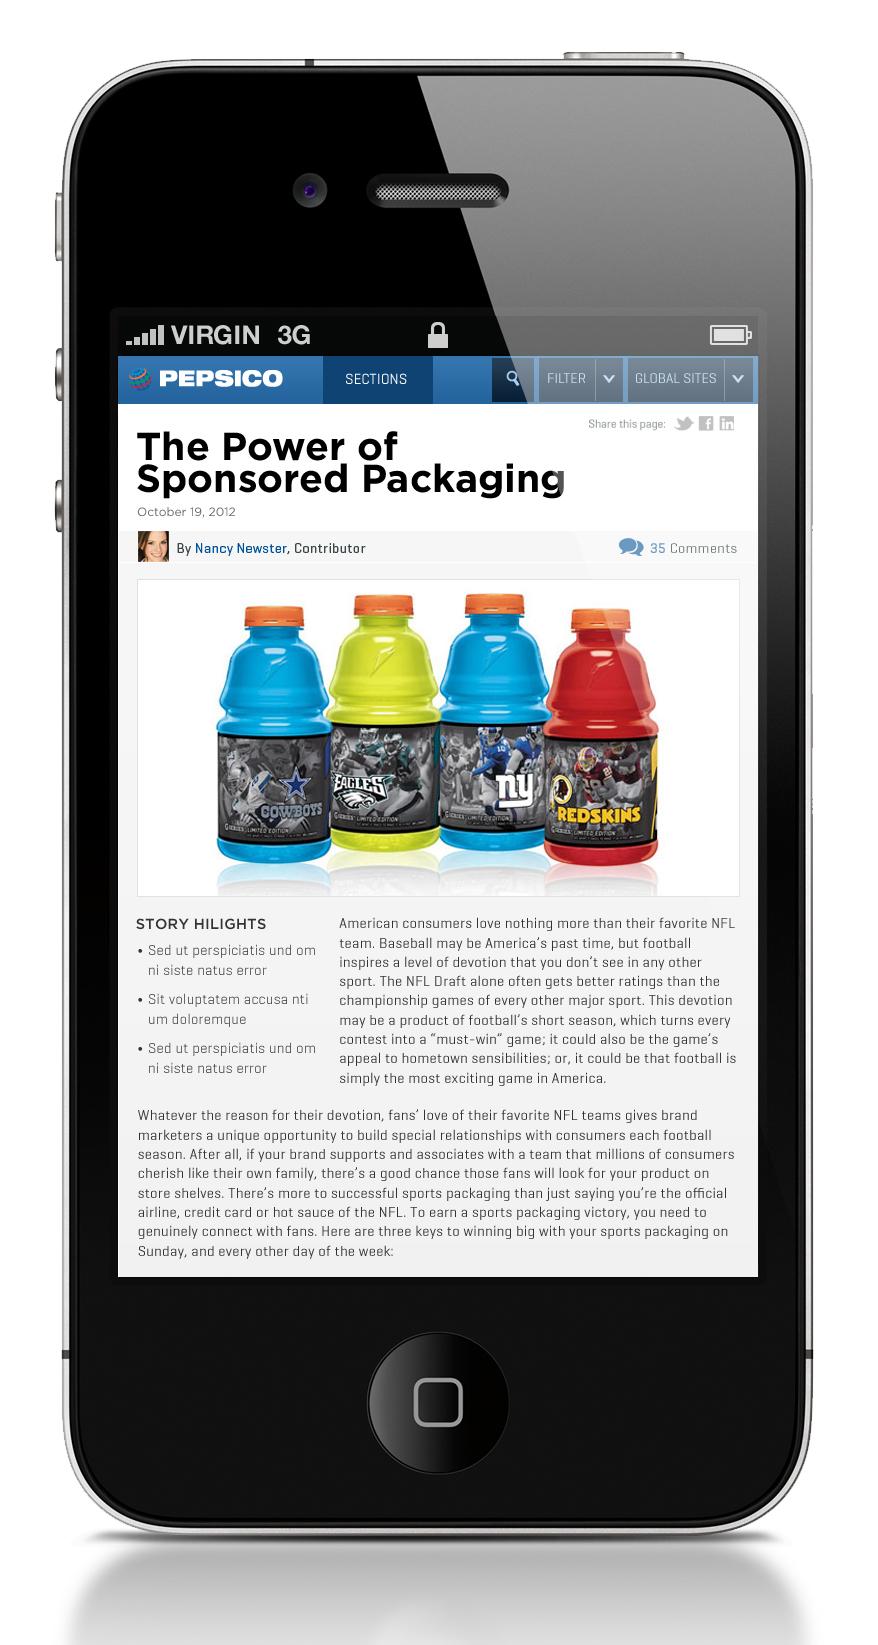 Pepsico Mobile News Detail